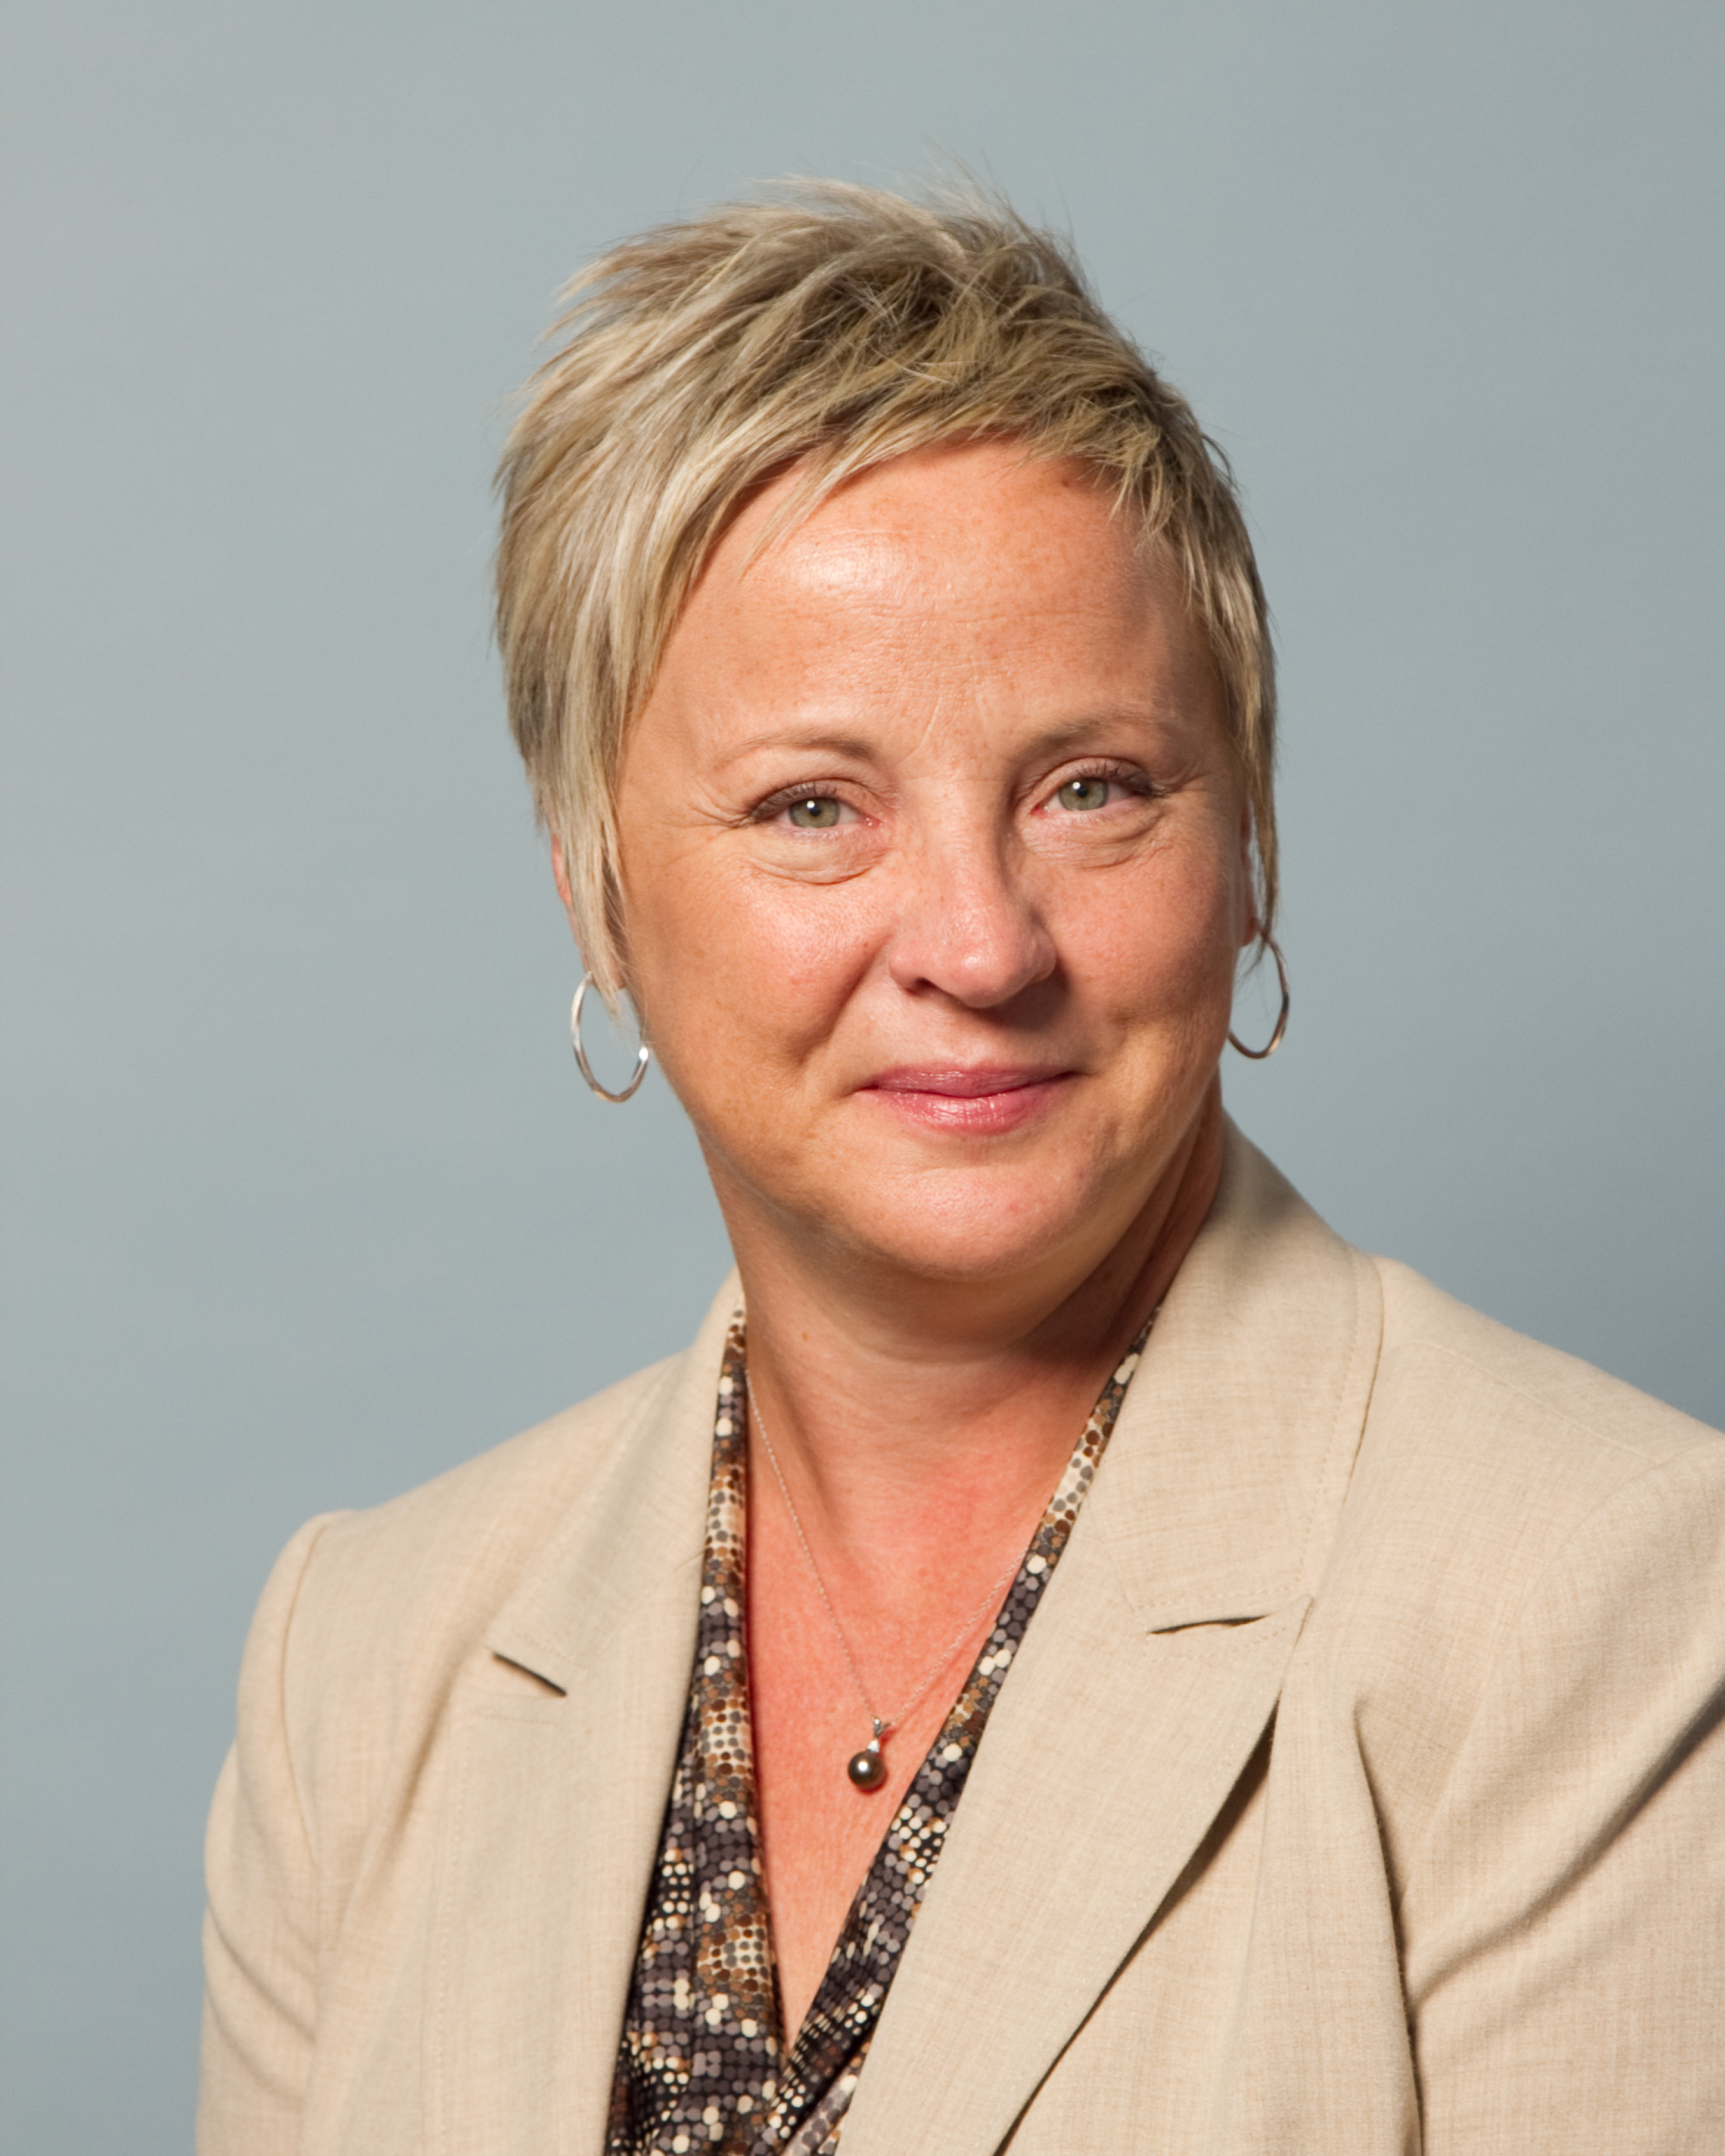 Marla Rybowiak head shot